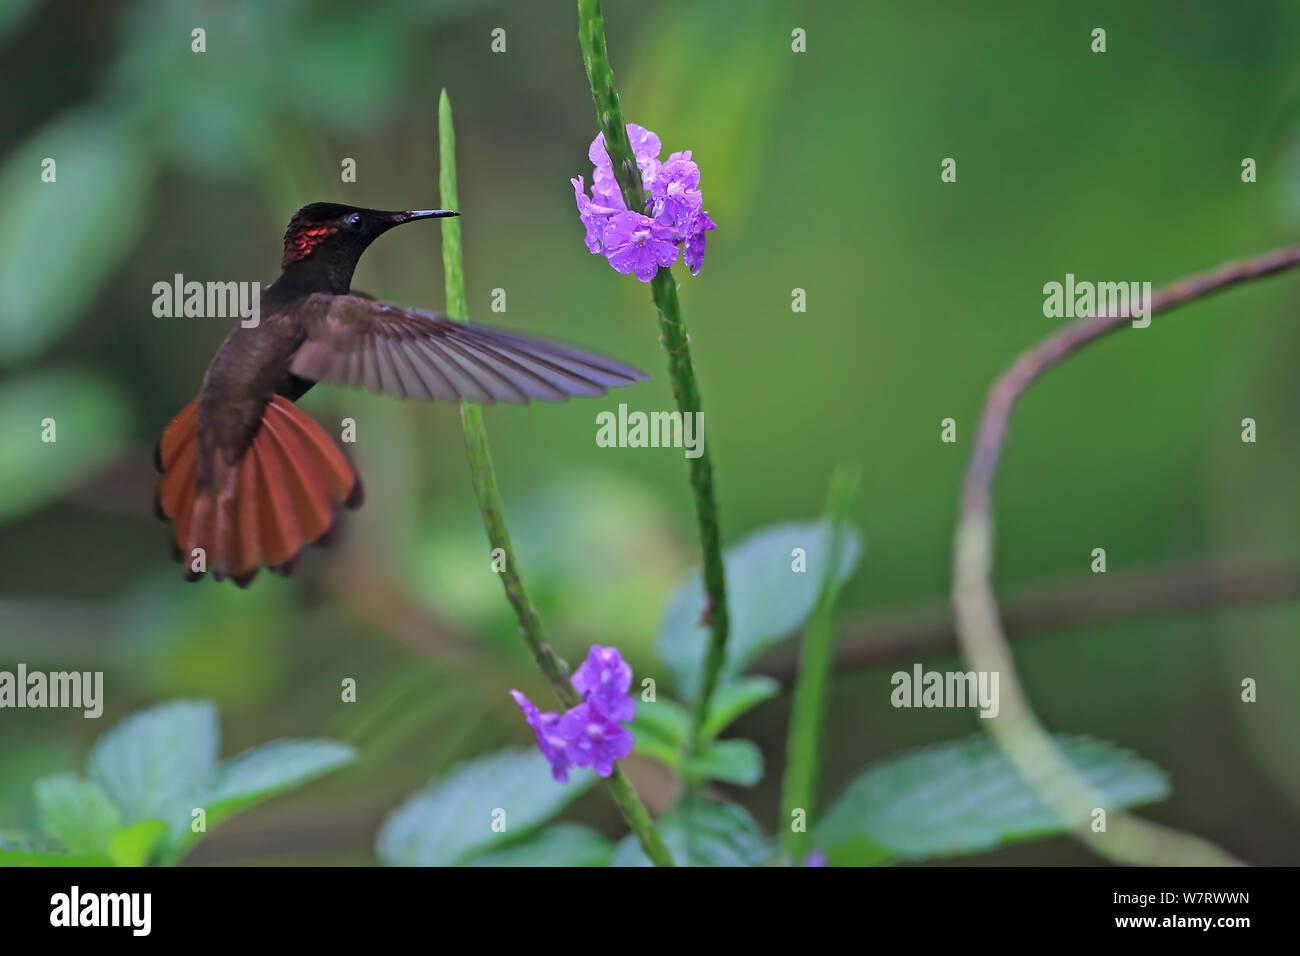 ruby topaz chrysolampis mosquitus in flight trinidad trinidad and tobago april W7RWWN